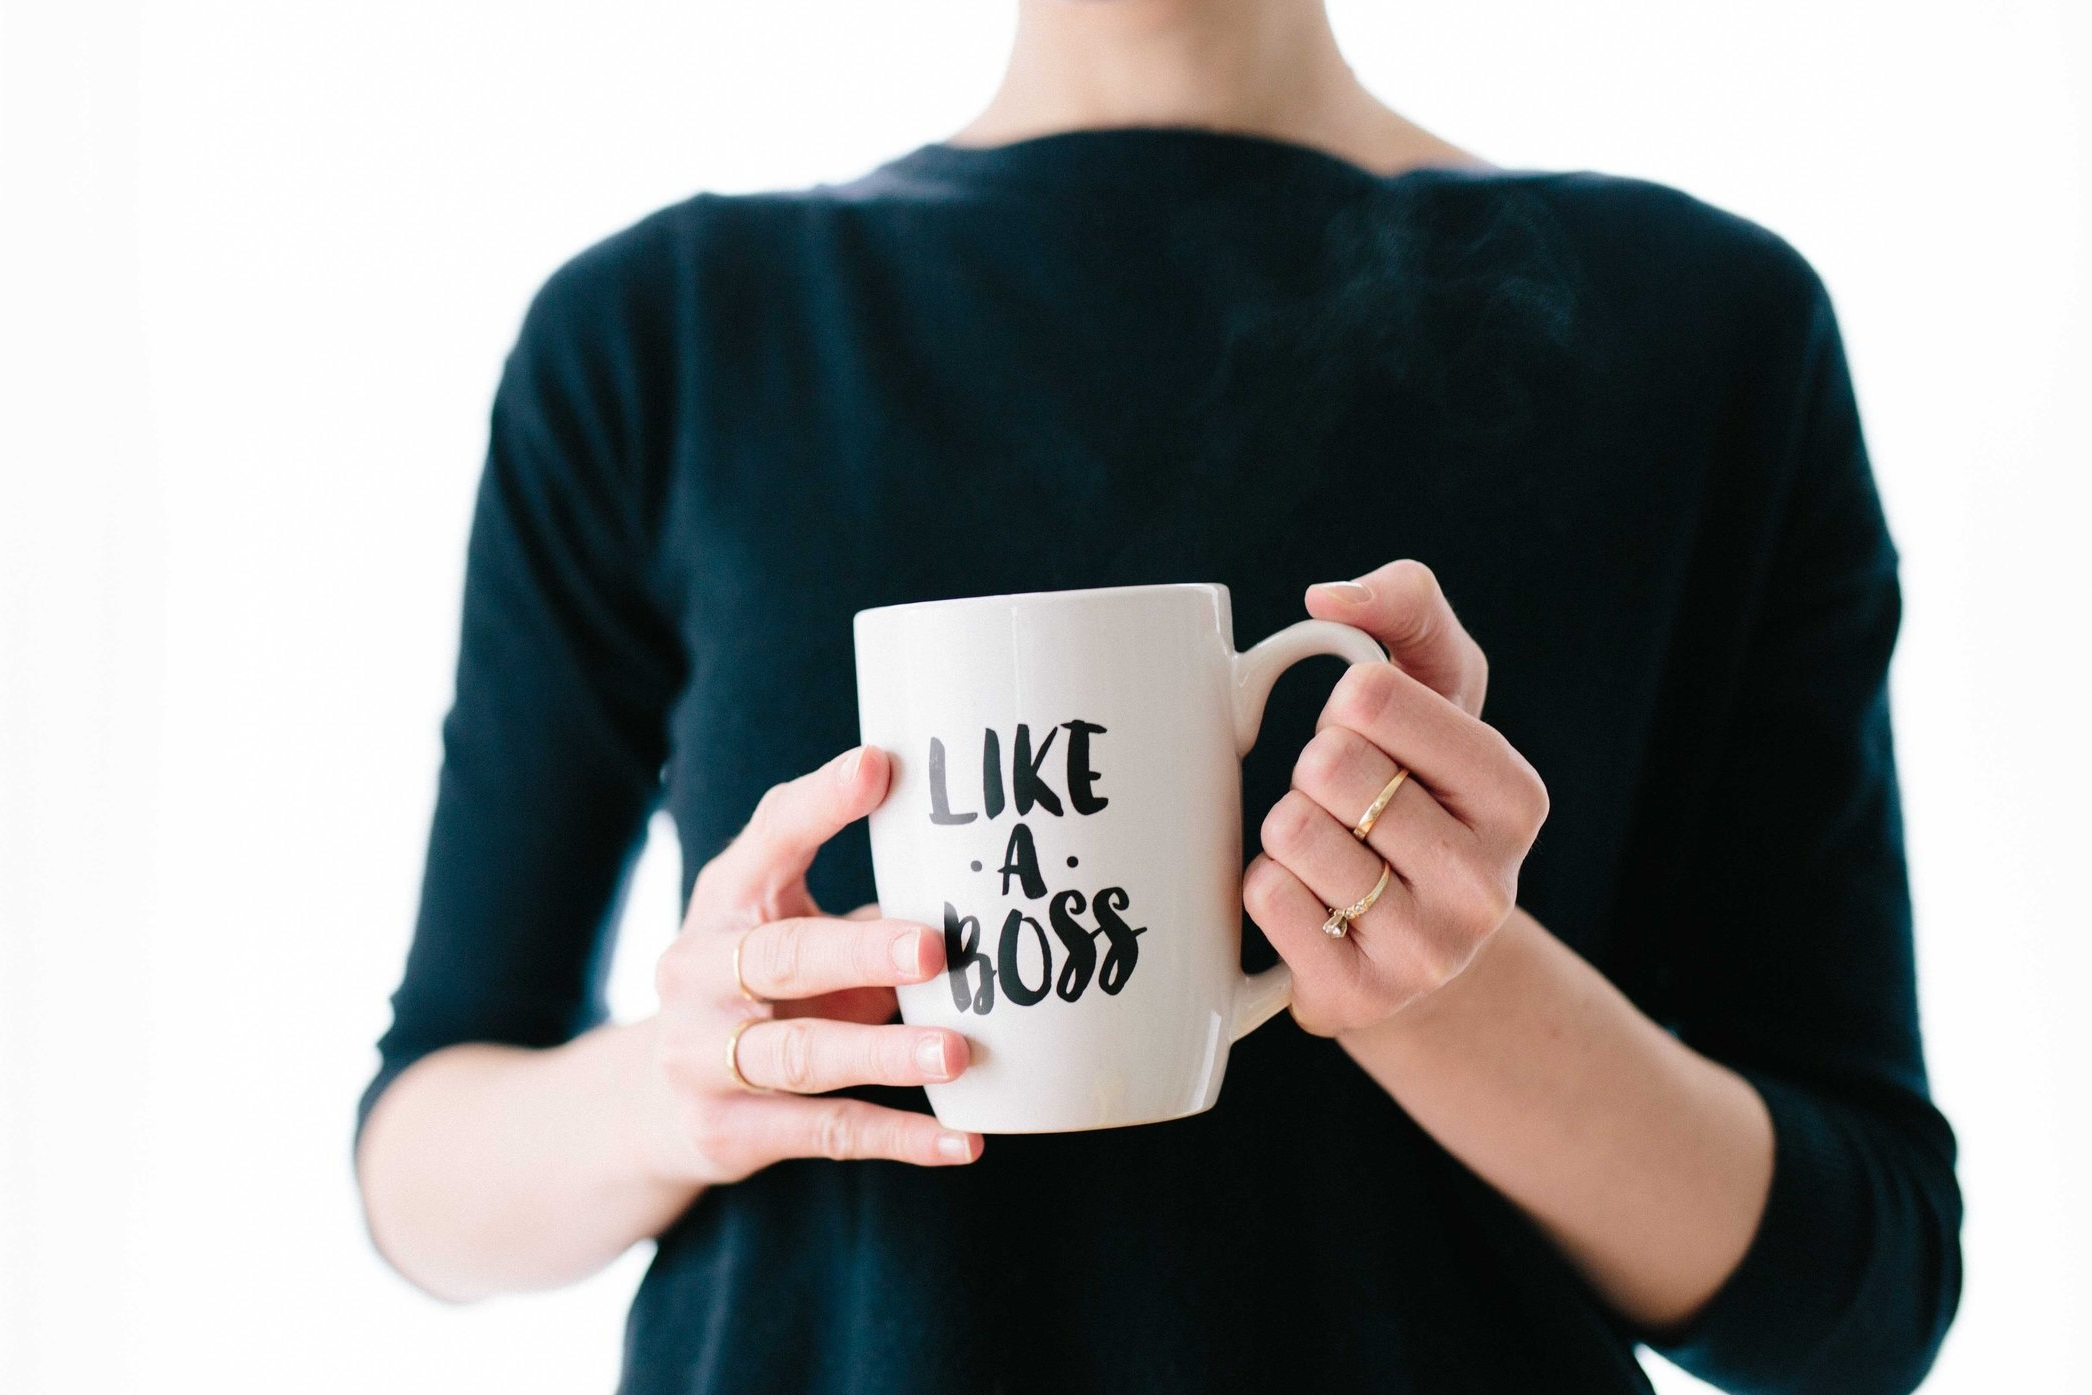 like-a-boss-mug.jpg